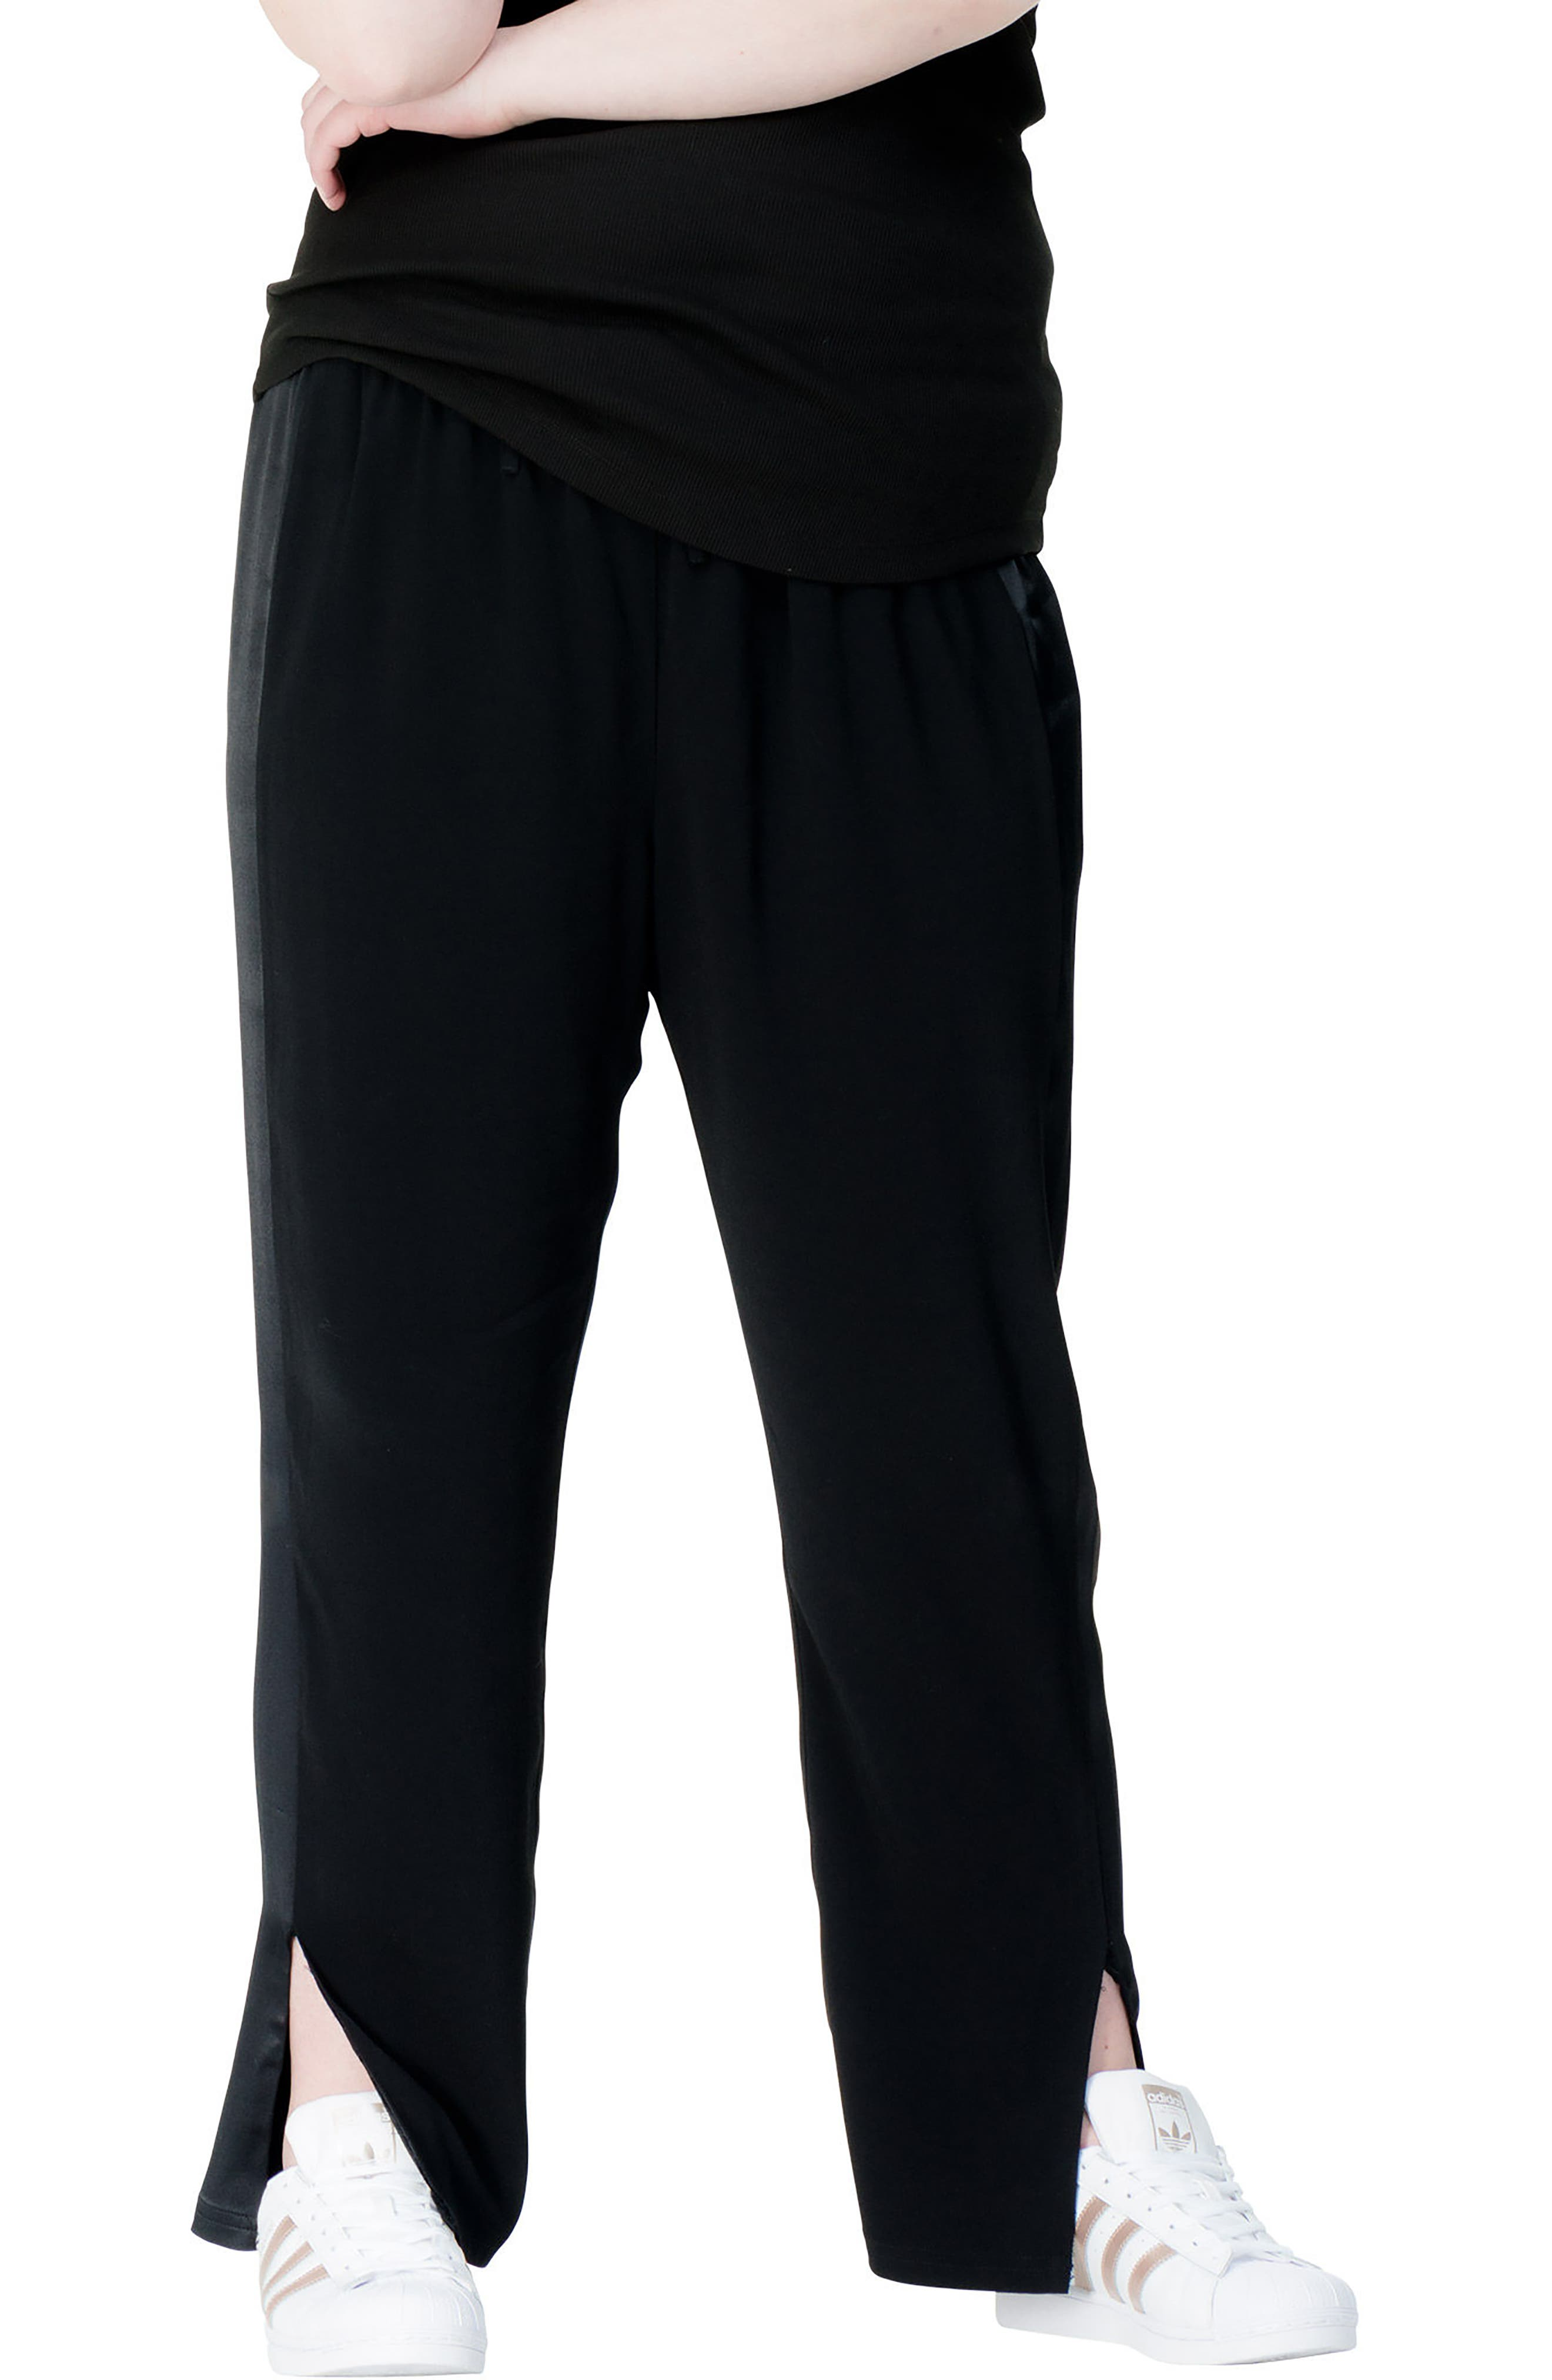 UNIVERSAL STANDARD Beaufort Track Pants